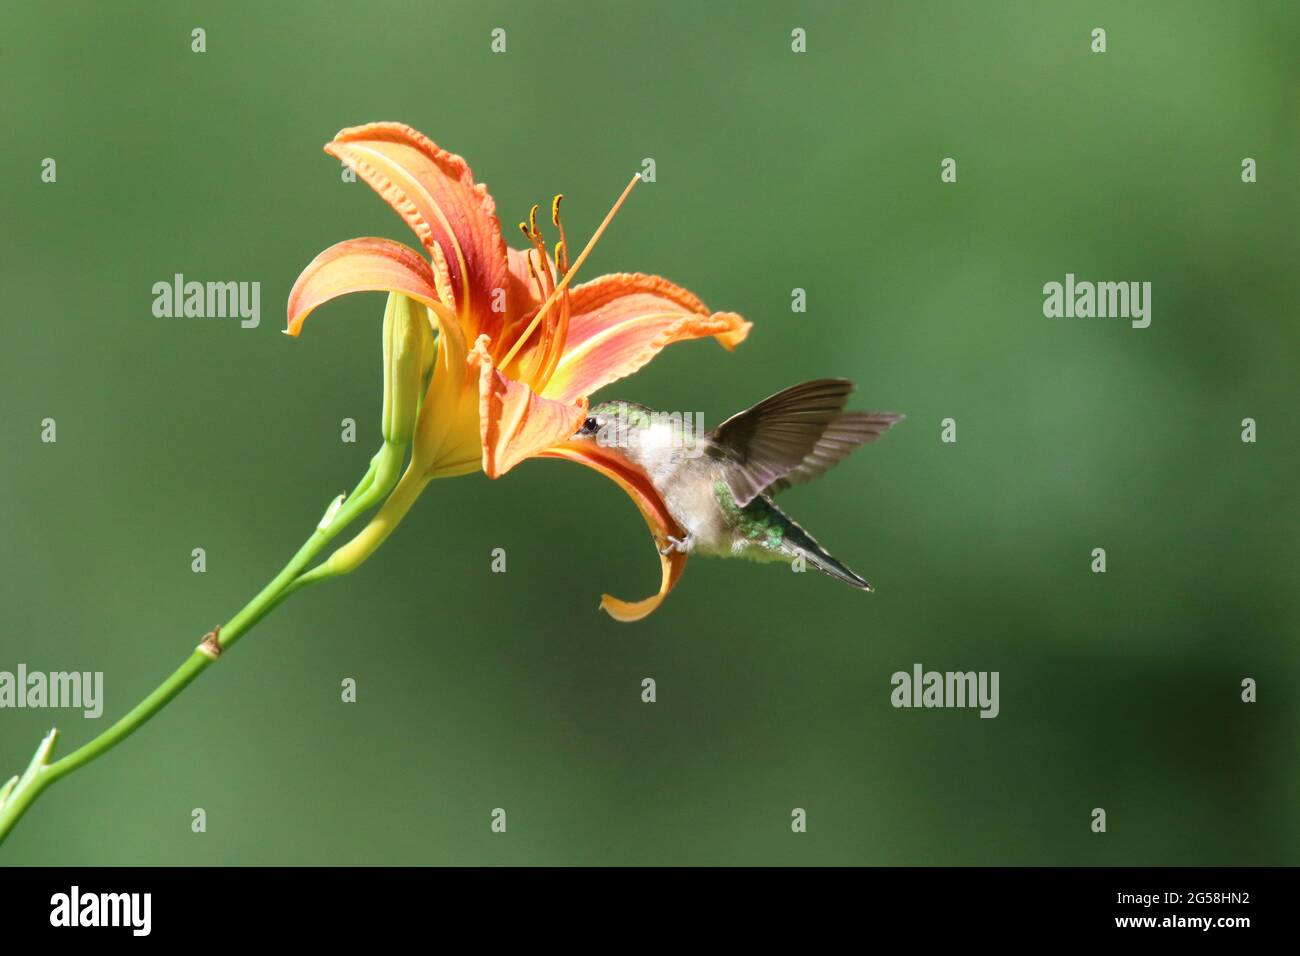 Female Ruby Throated hummingbird feeding on nectar from a daylily flower Stock Photo